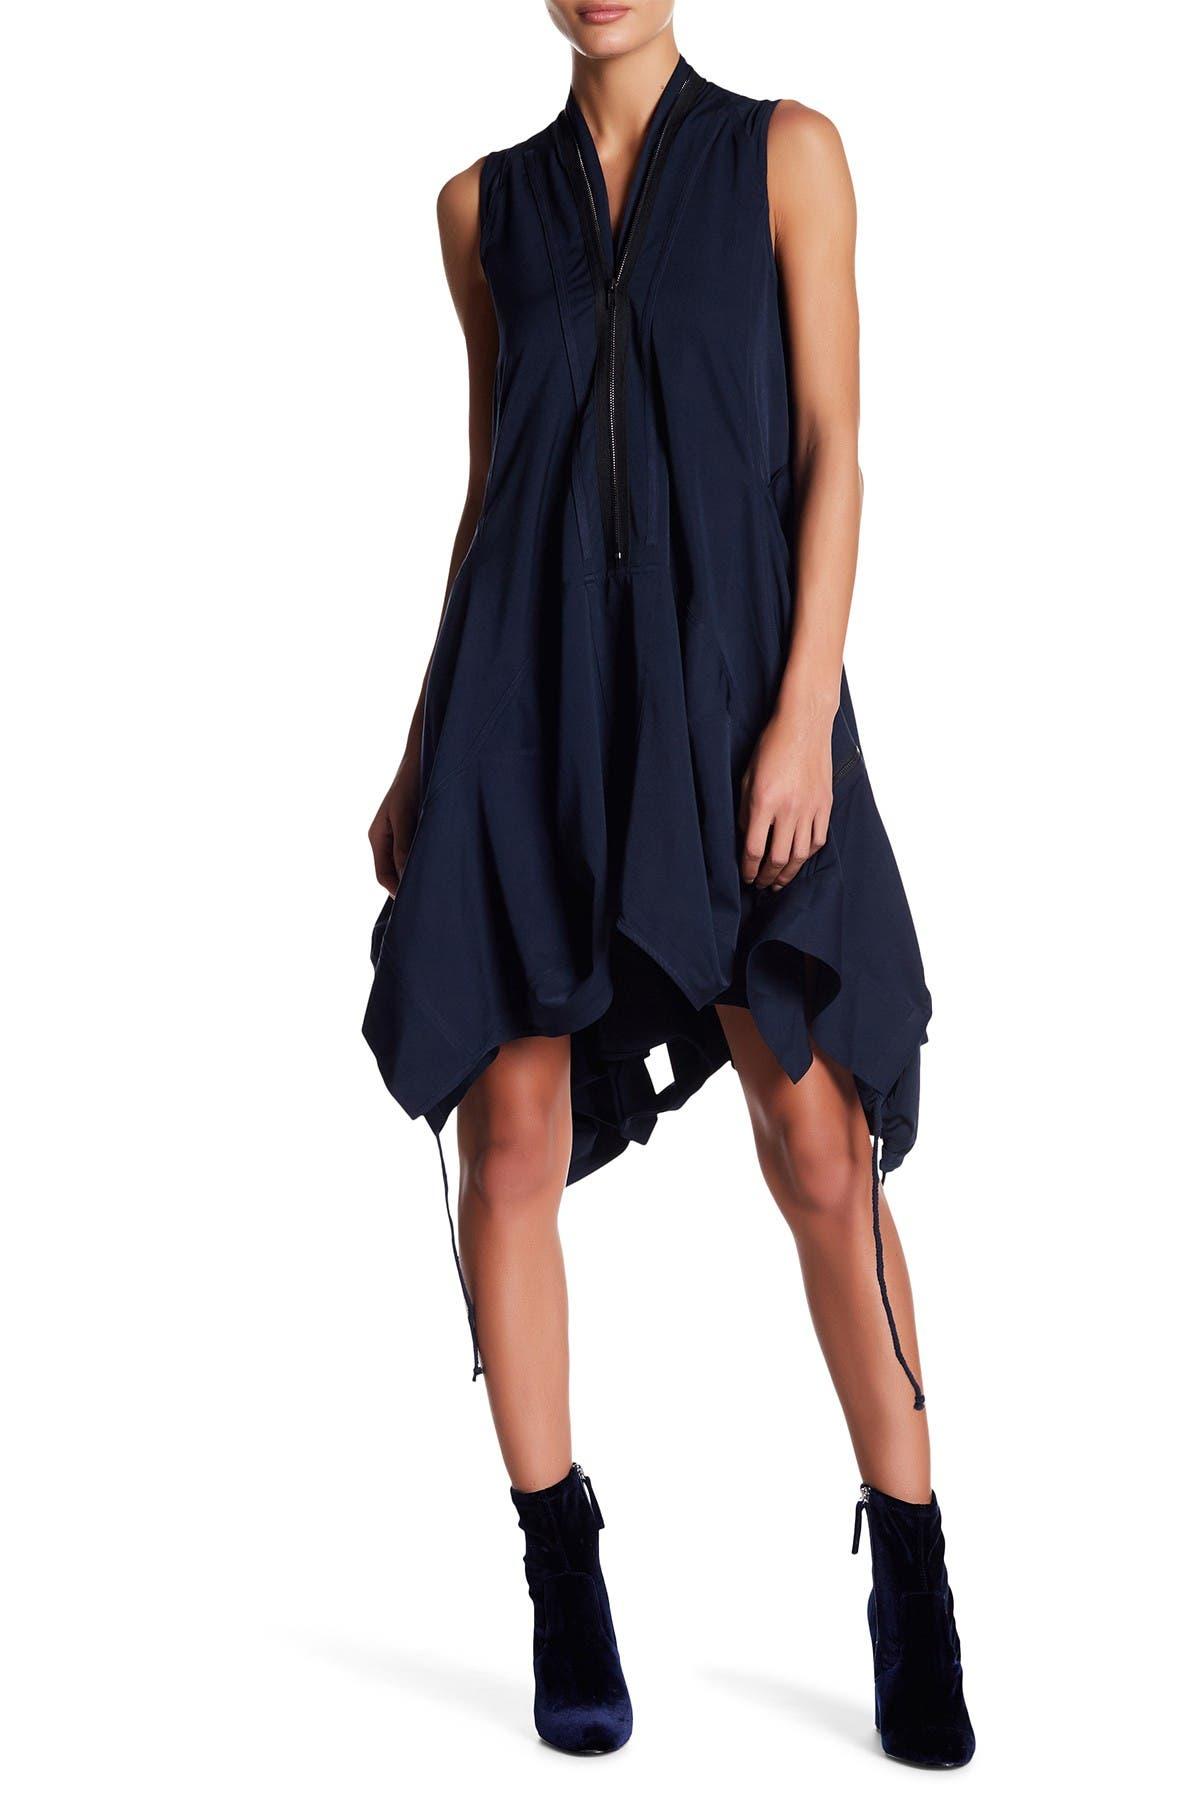 Image of Gracia Asymmetrical Zip Trim Dress